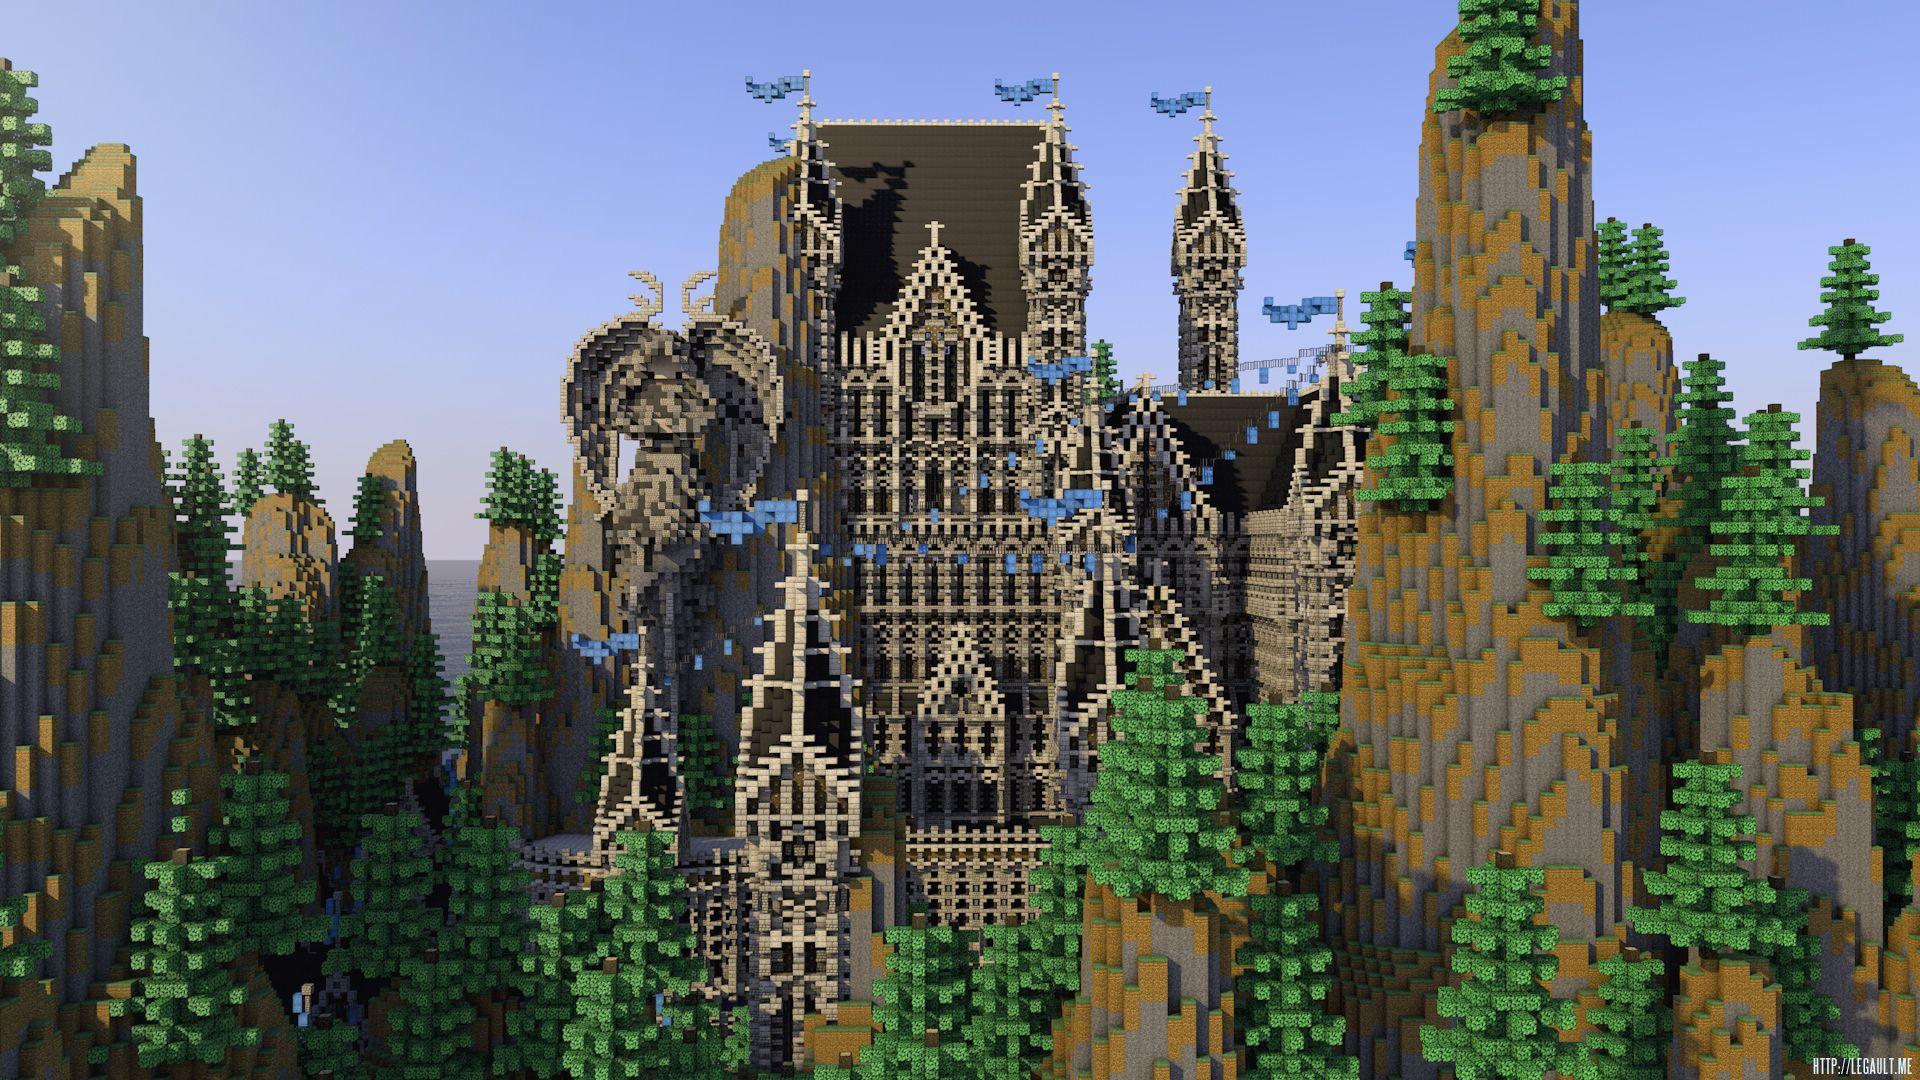 Minecraft Castle Render Mathieu Legault Cinema 4d